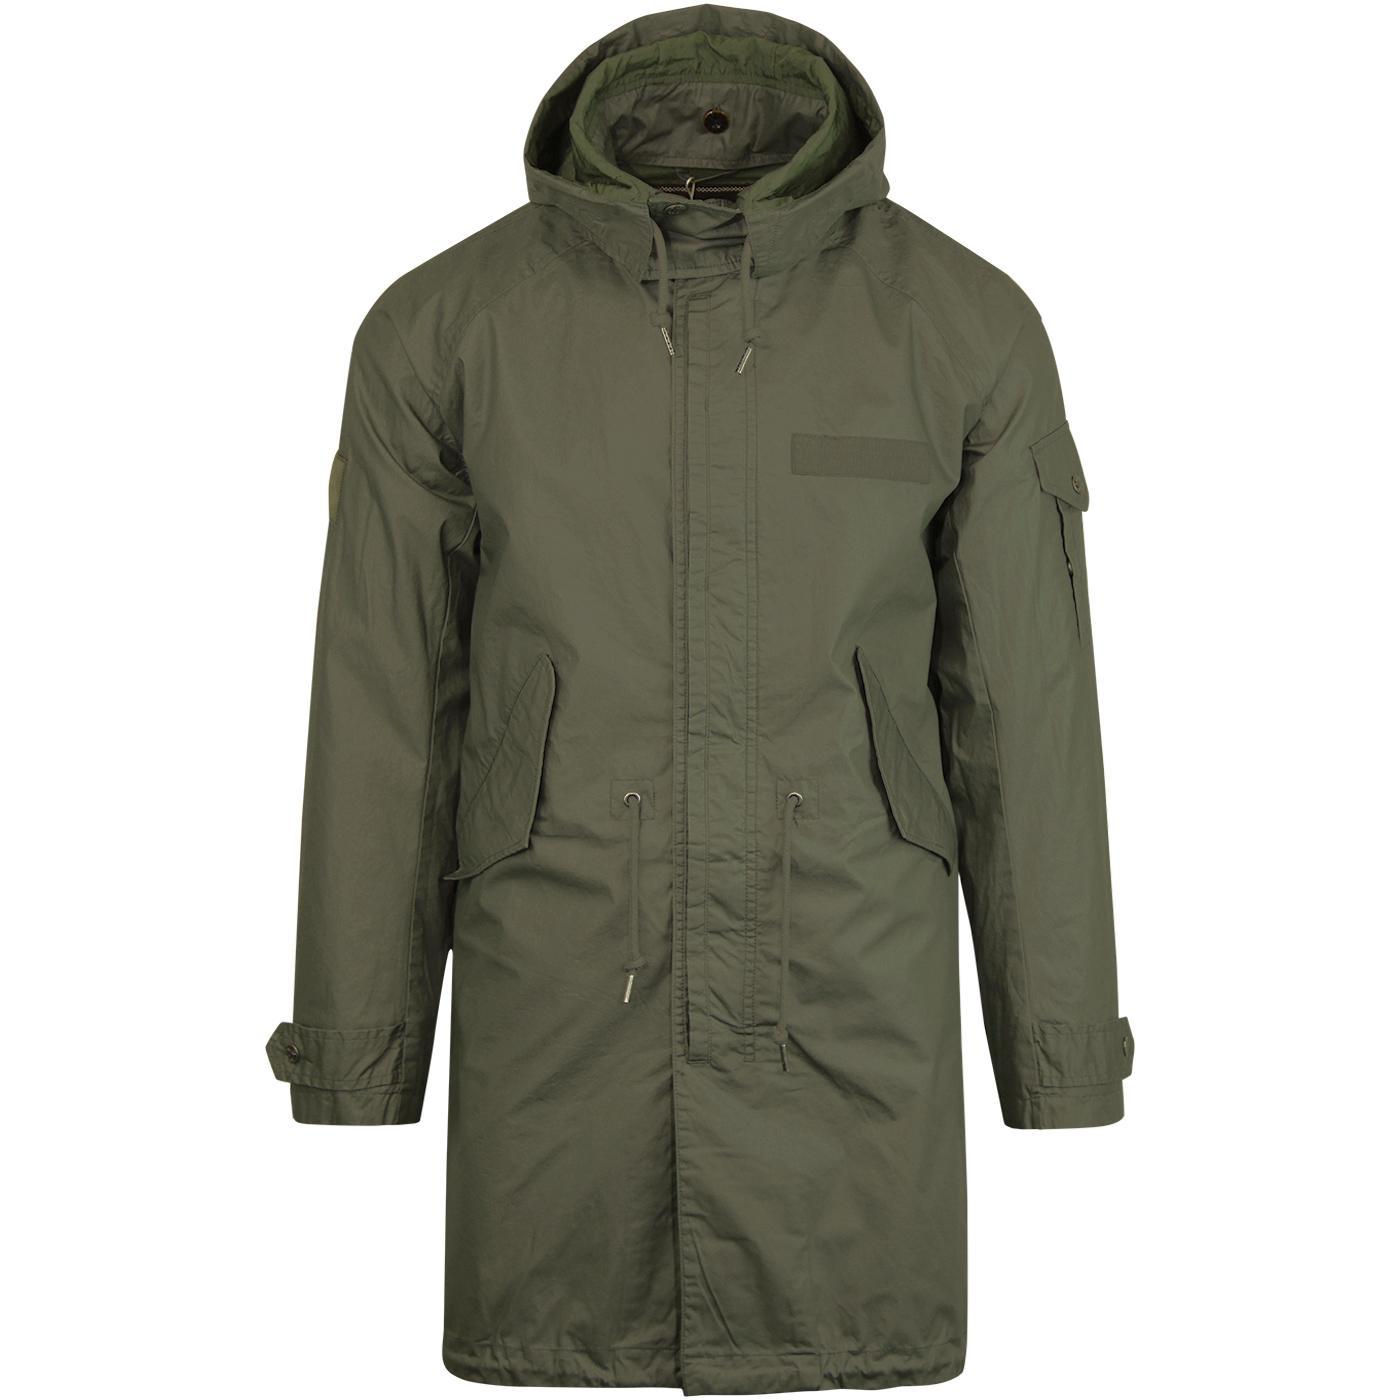 PRETTY GREEN Mod Detachable Hood Light Parka Coat